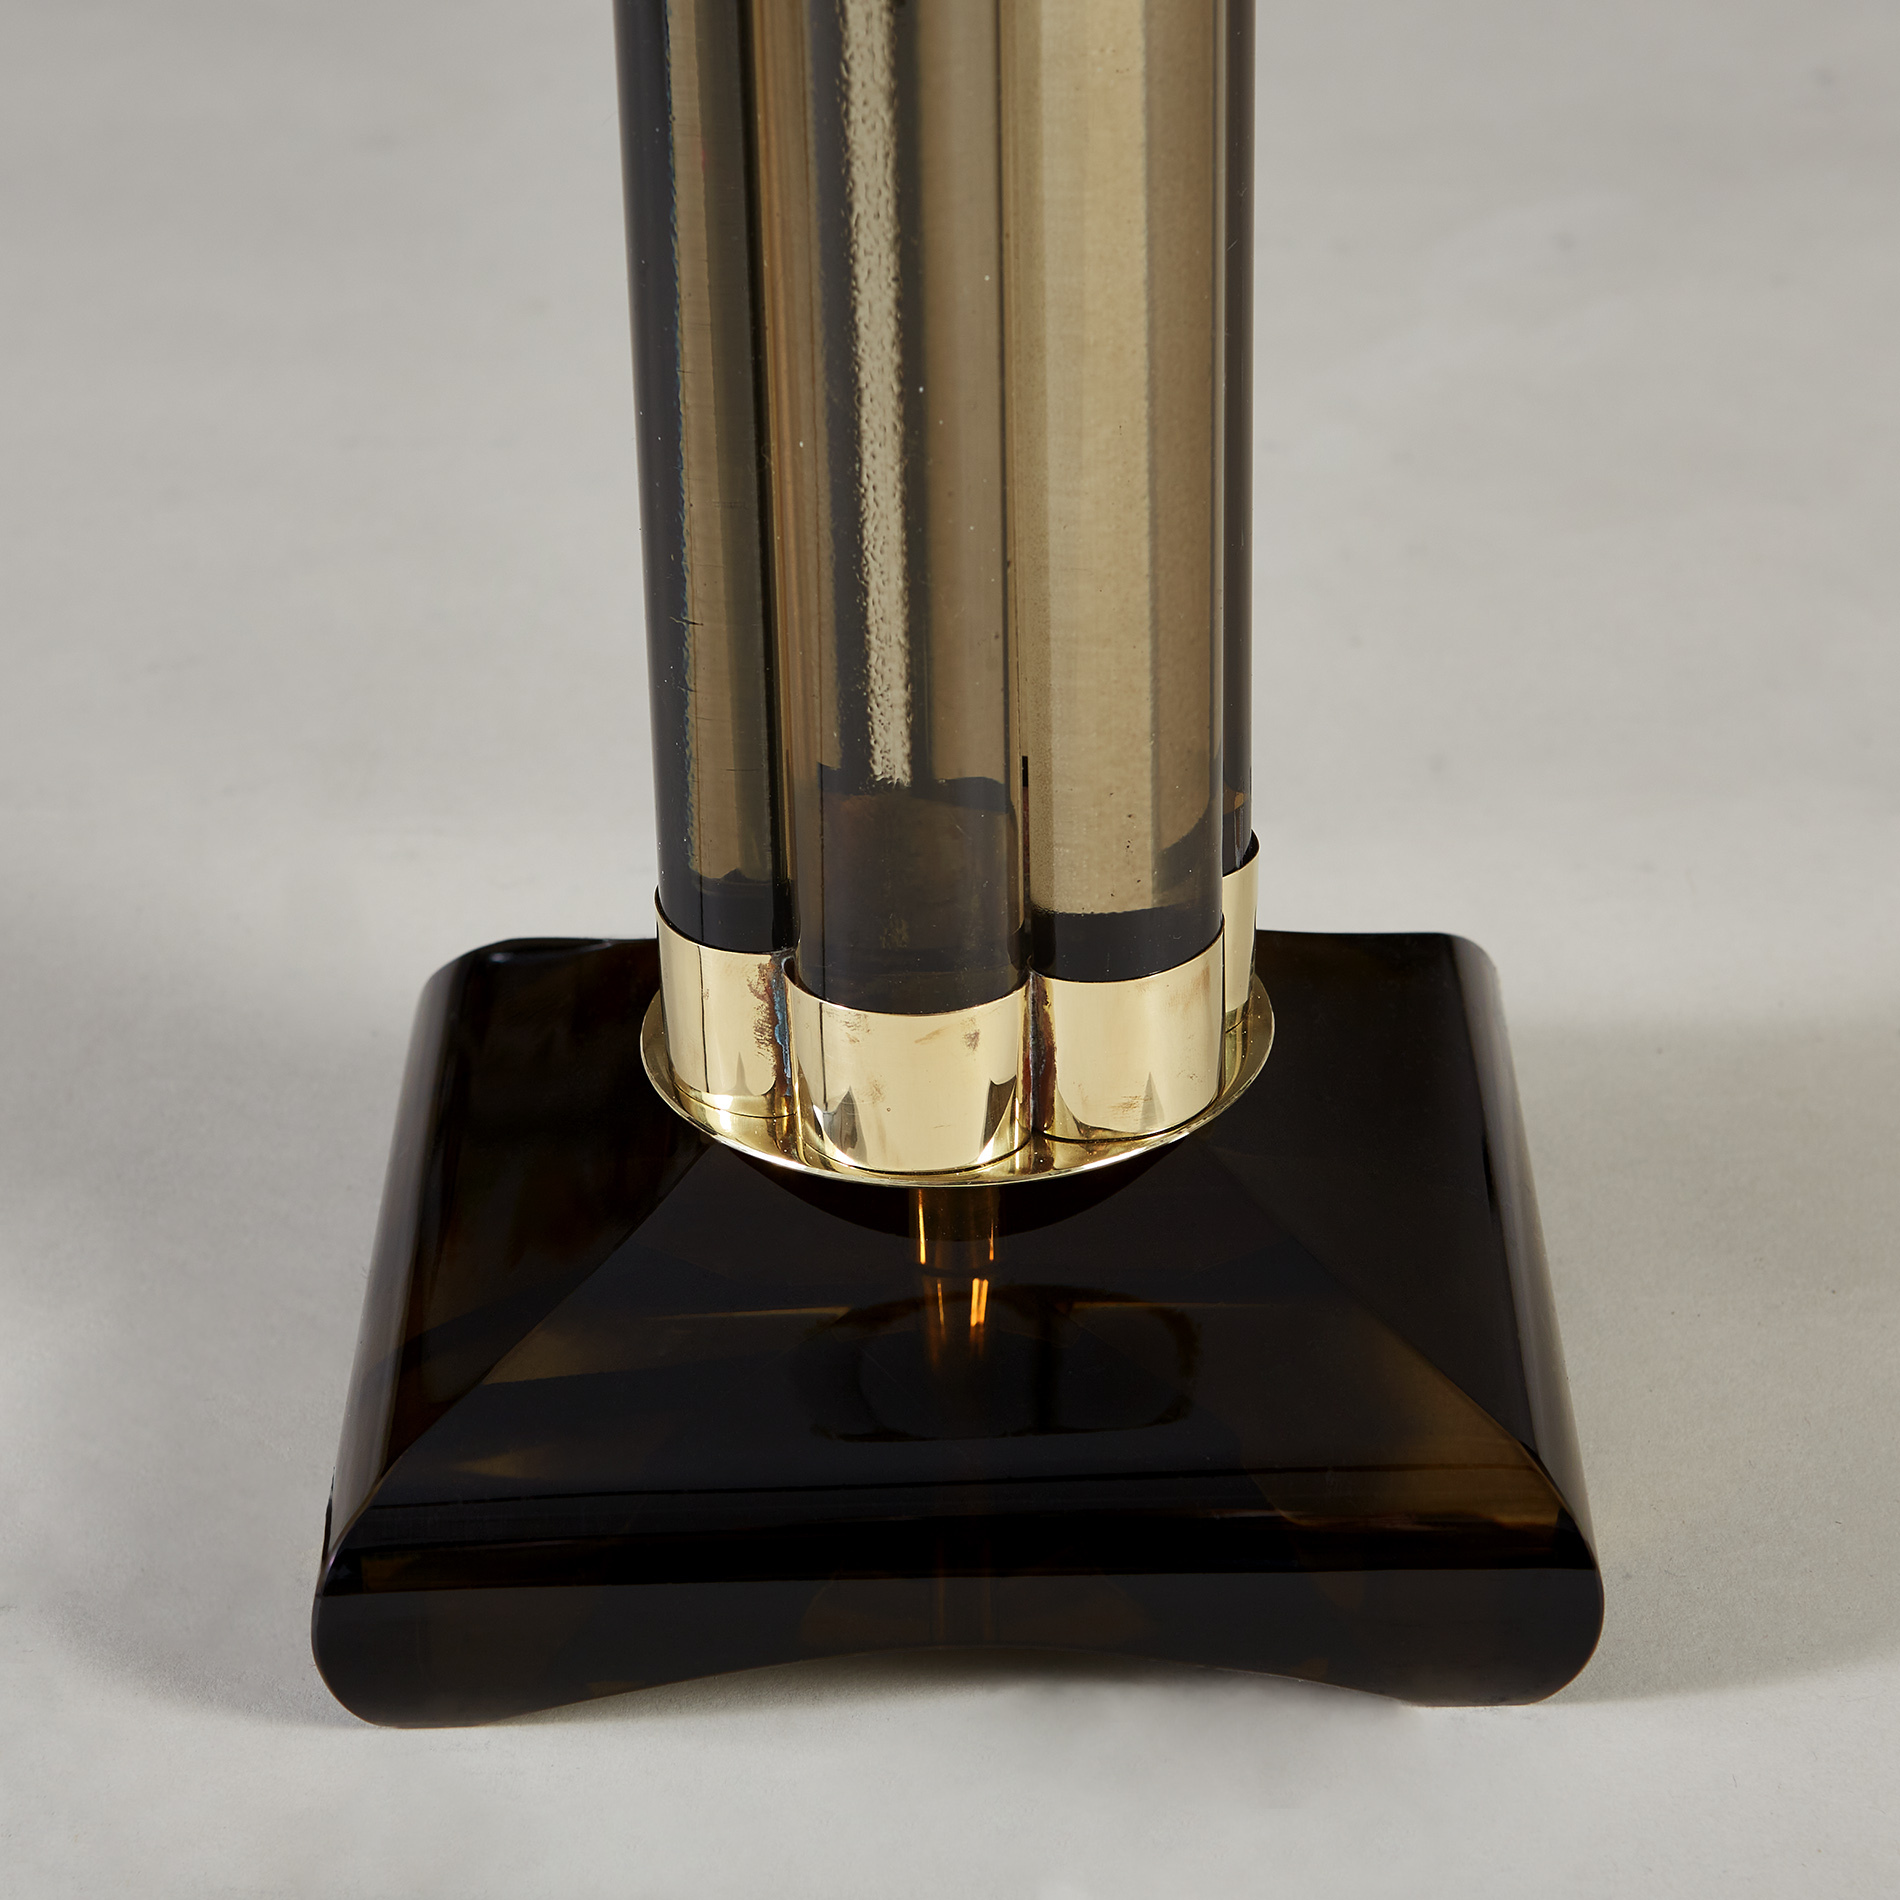 Smokey Crystal Column Lamps 20210225 Valerie Wade 2 192 V1